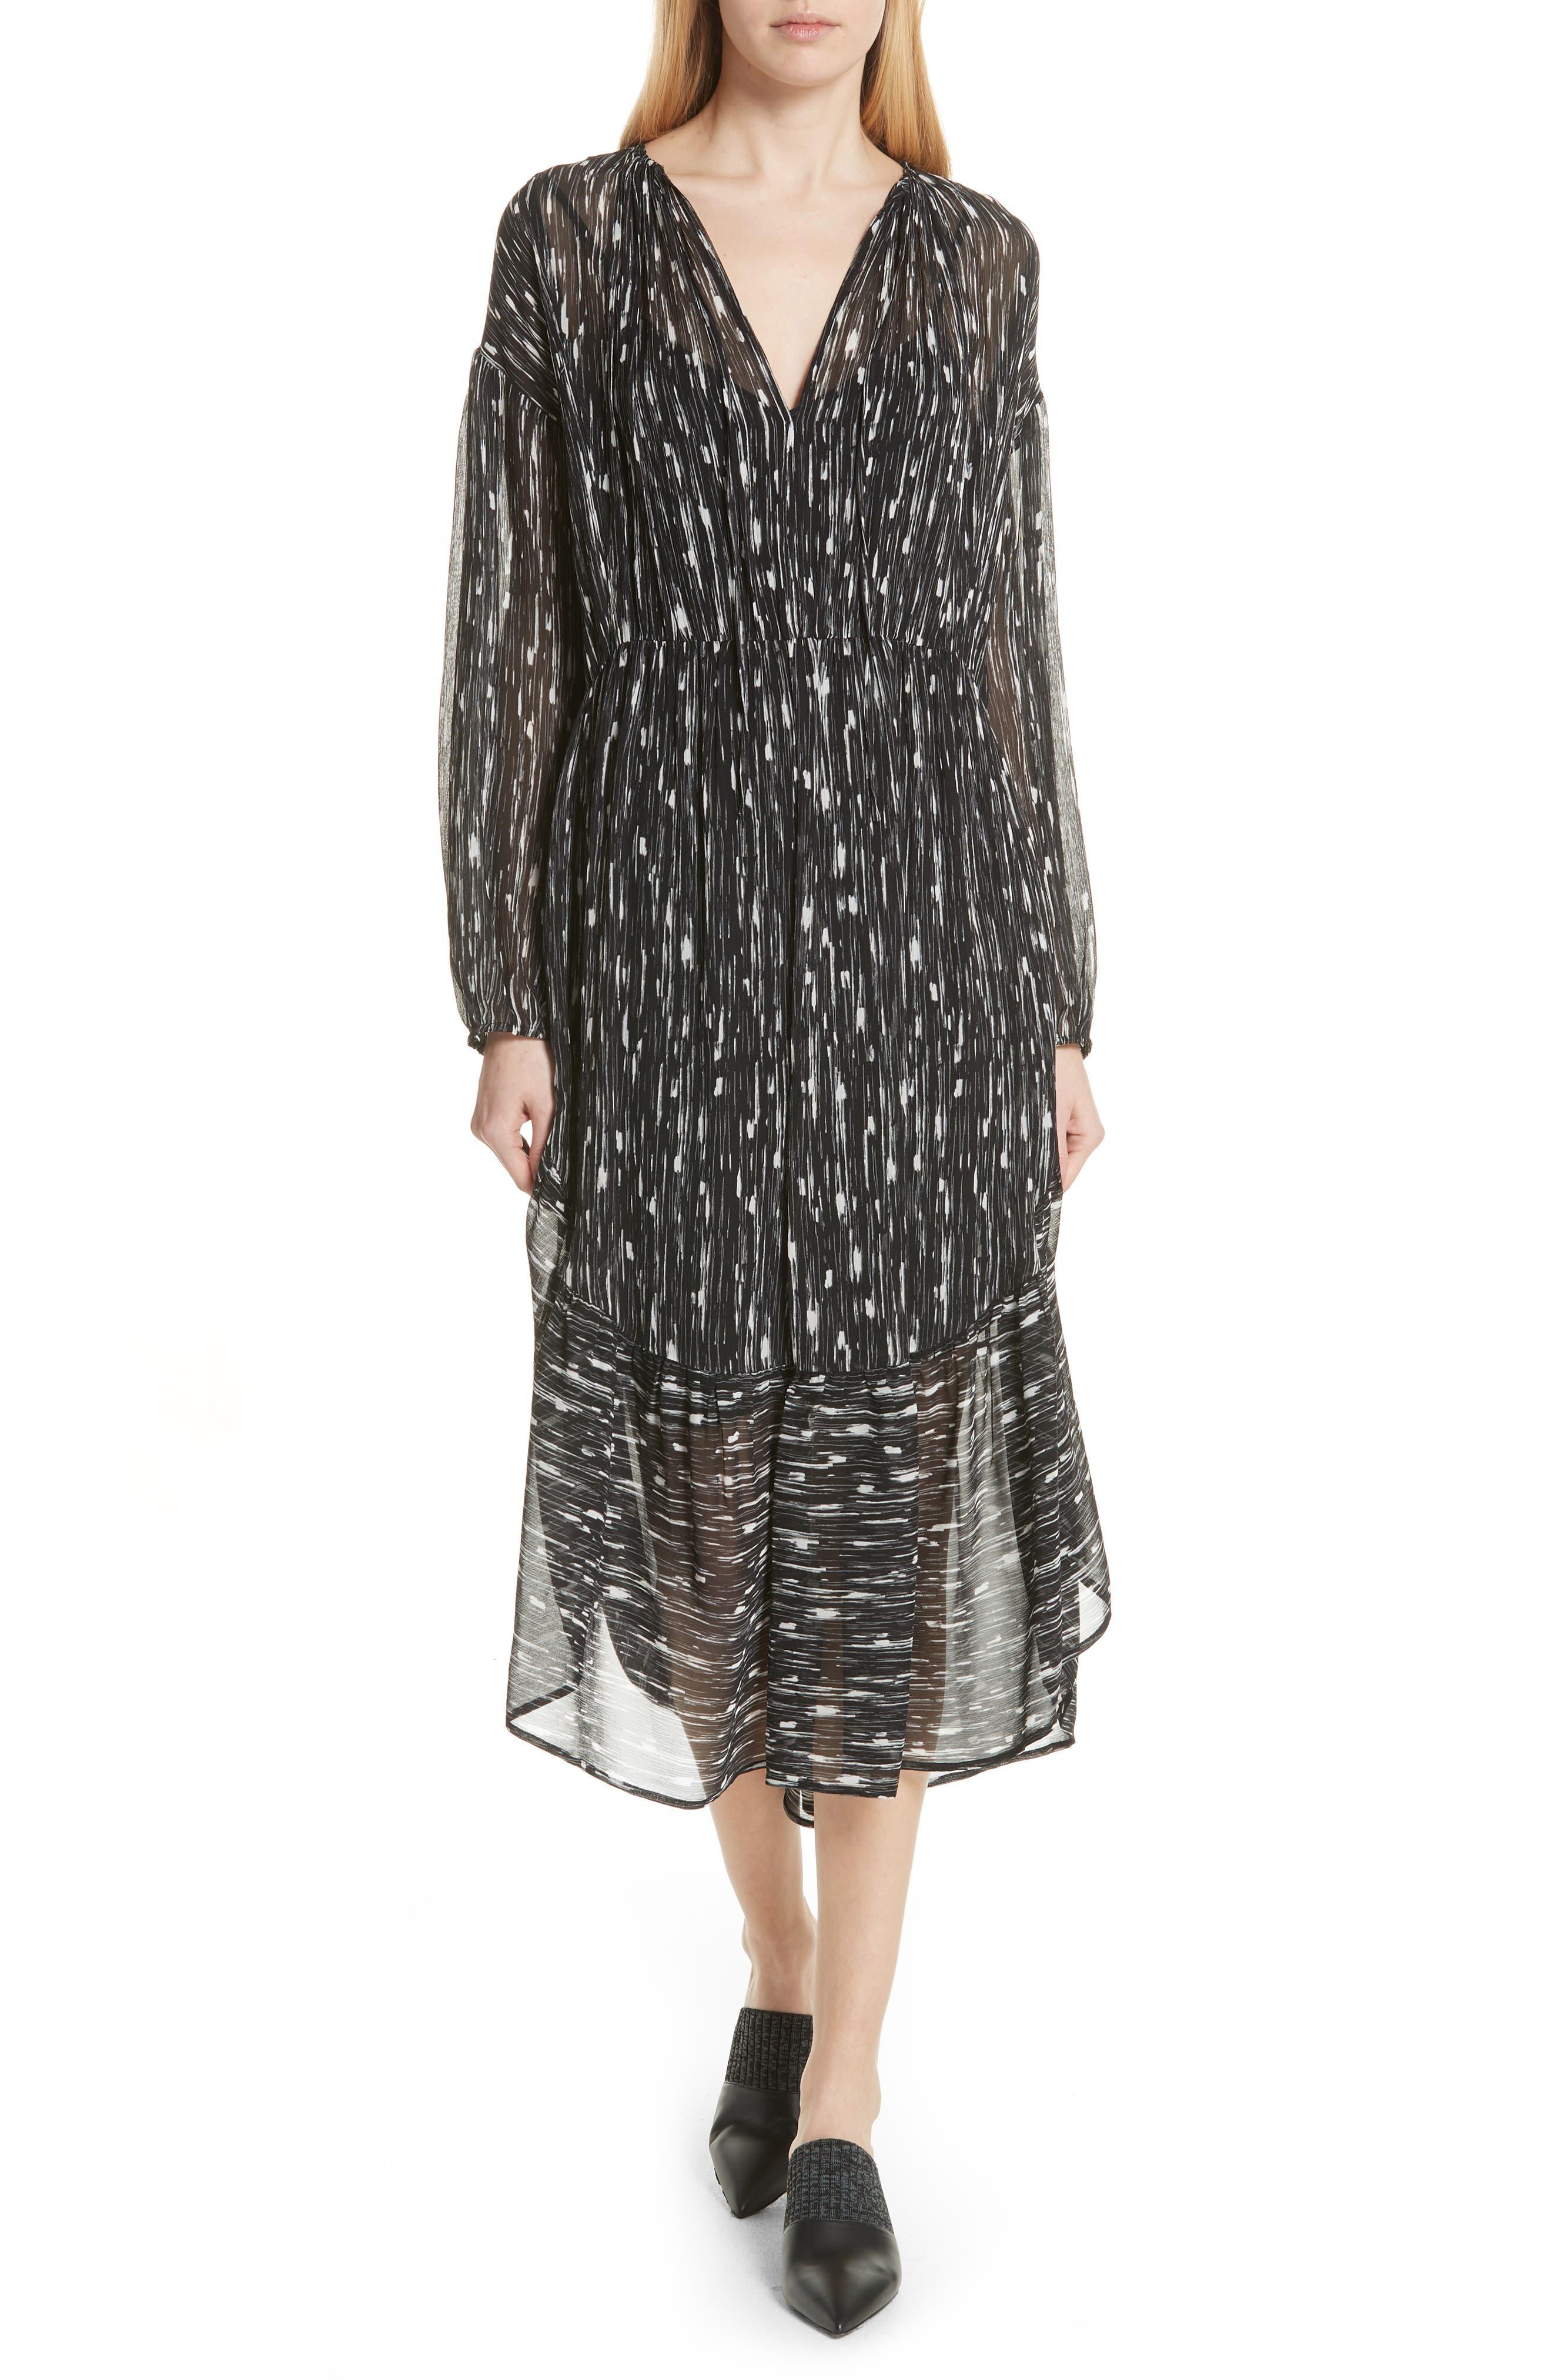 VINCE Brushstroke Silk Chiffon Dress, Main, color, 001